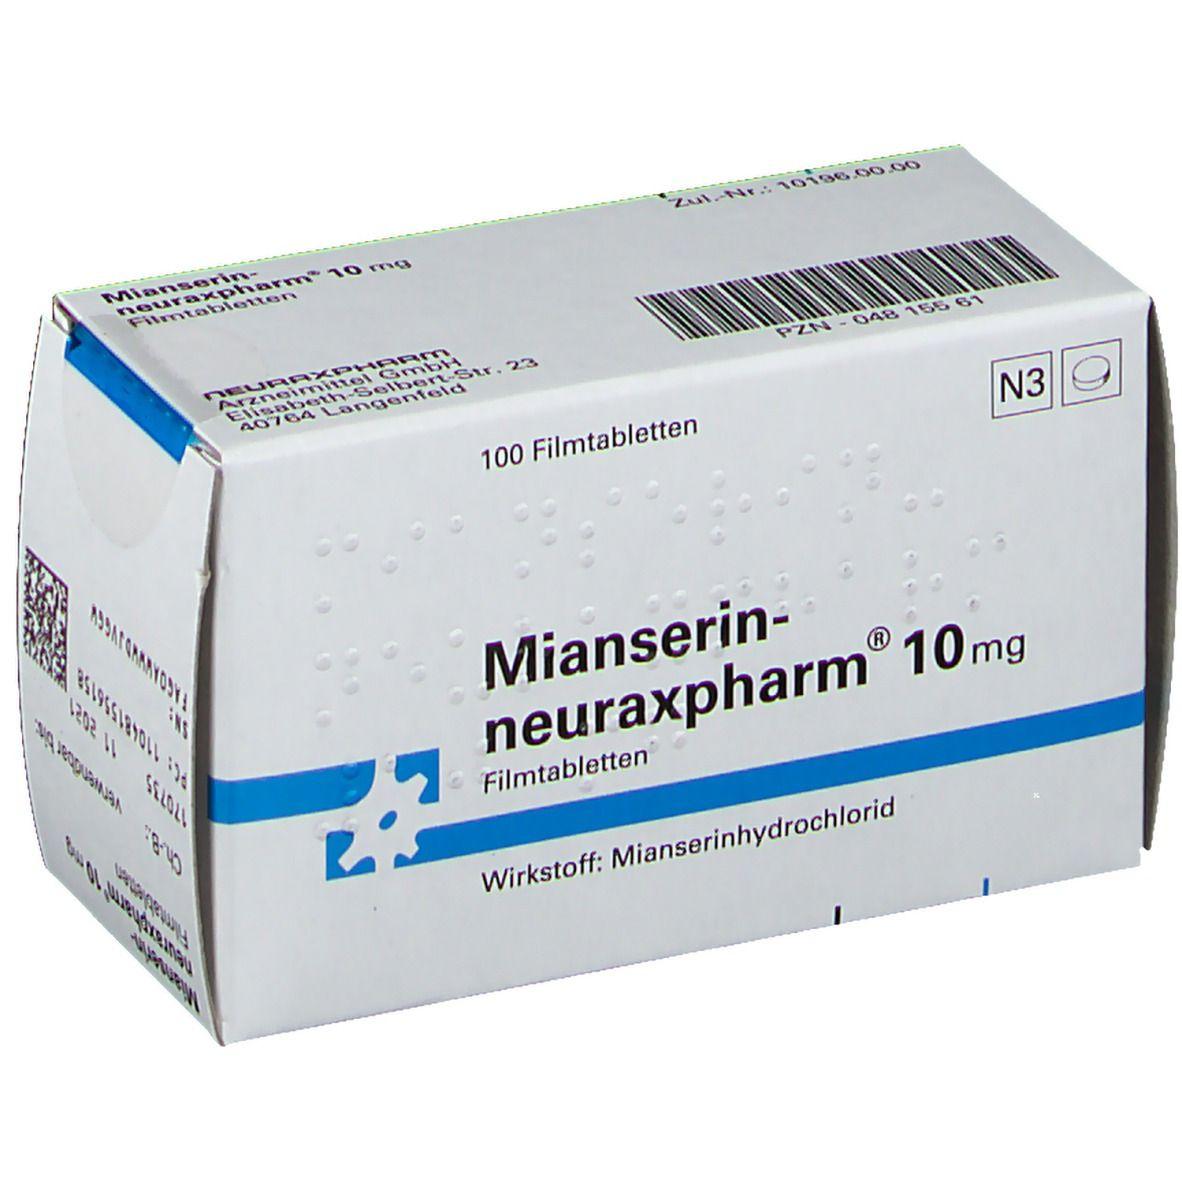 Mianserin-neuraxpharm® 10 mg 100 St - shop-apotheke.com